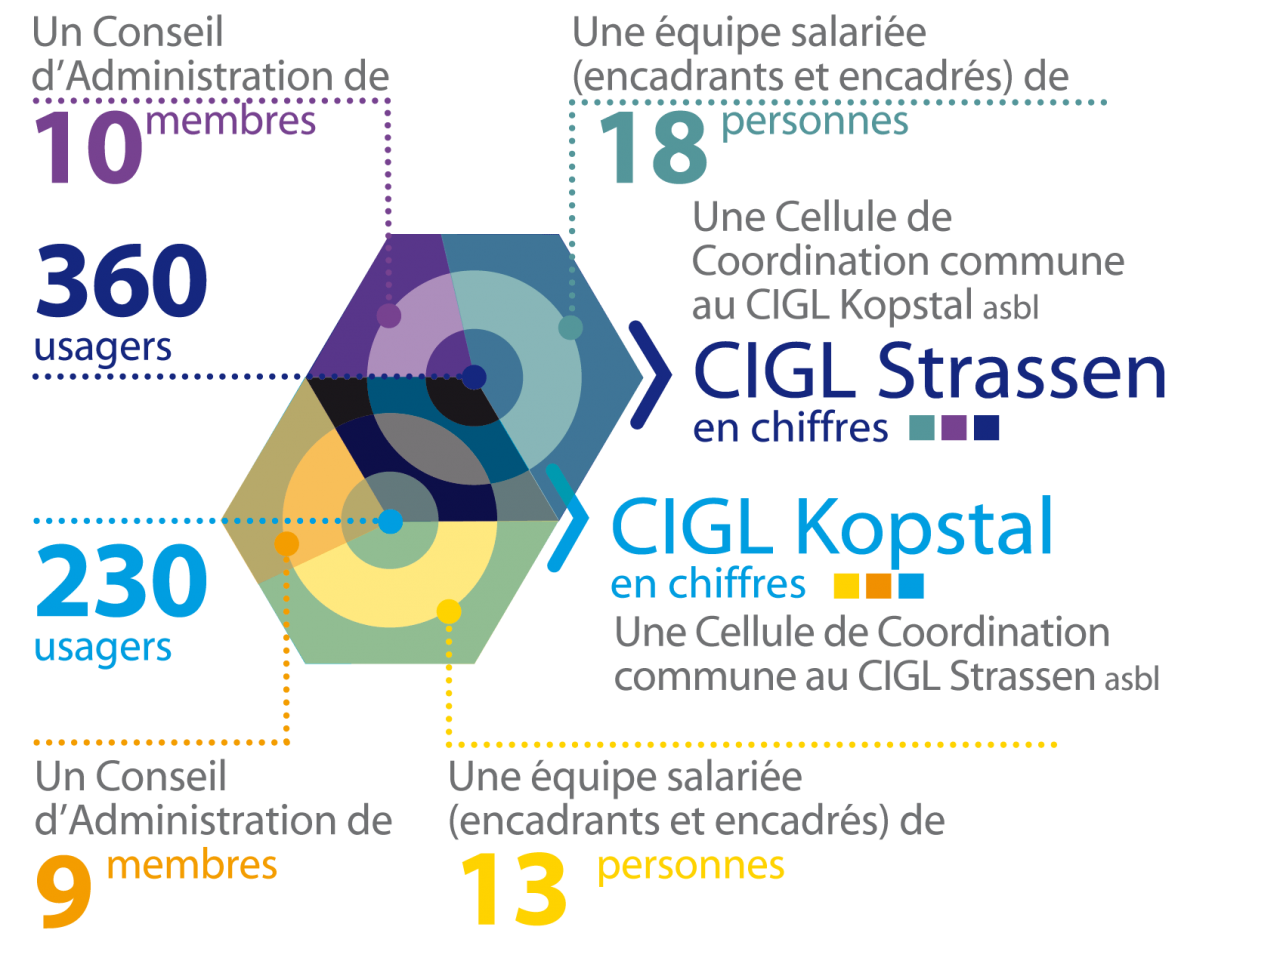 cigl-strassen-kopstal-en-chiffres